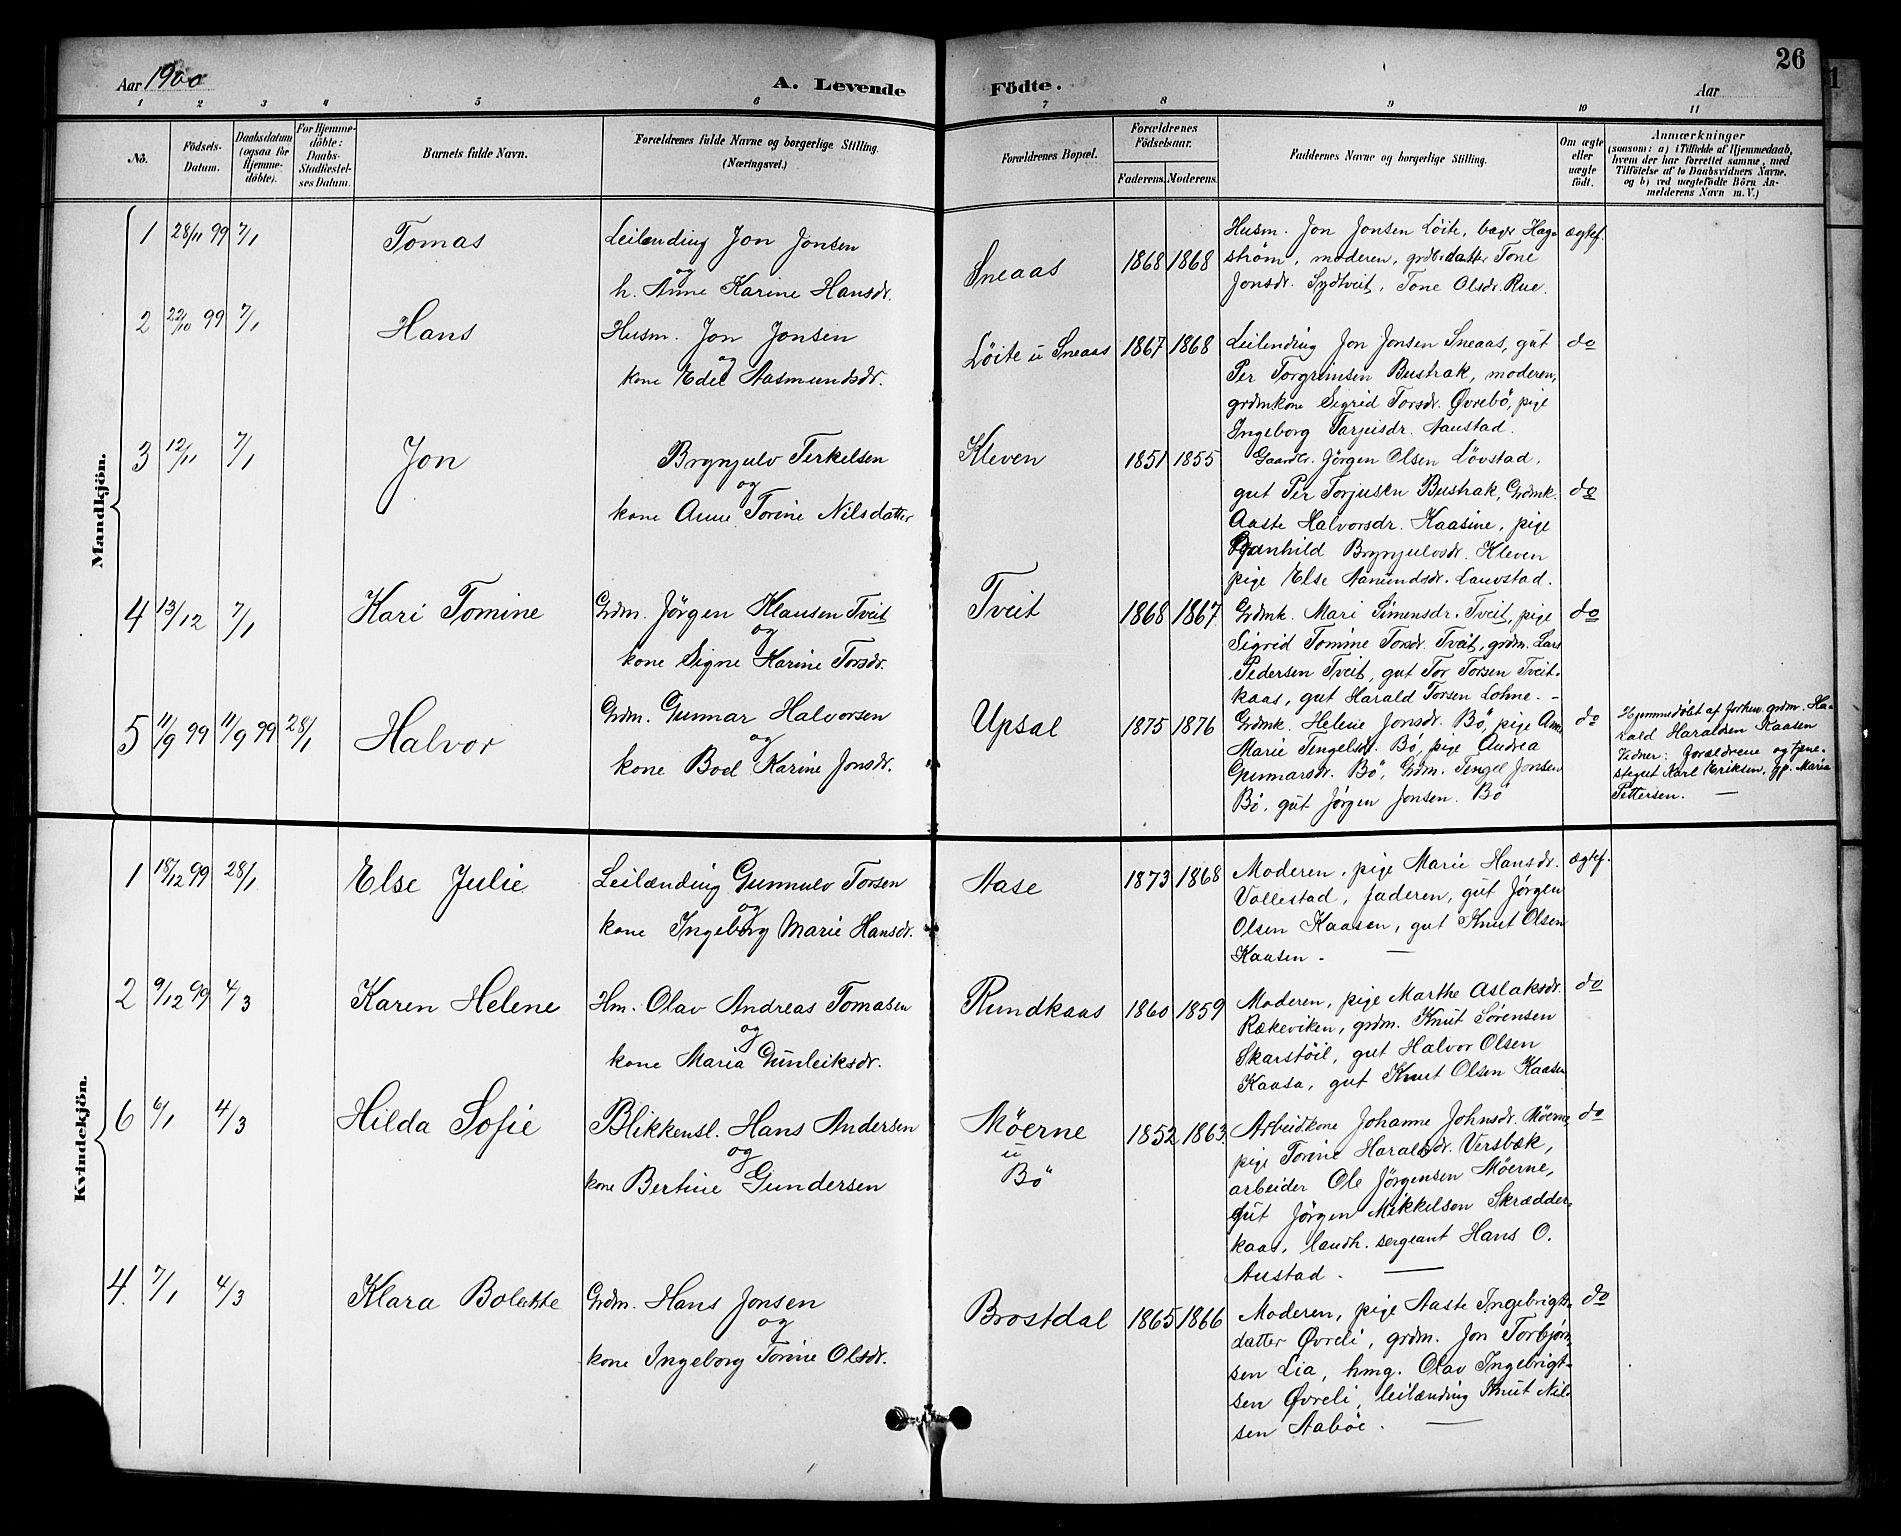 SAKO, Drangedal kirkebøker, G/Gb/L0002: Klokkerbok nr. II 2, 1895-1918, s. 26